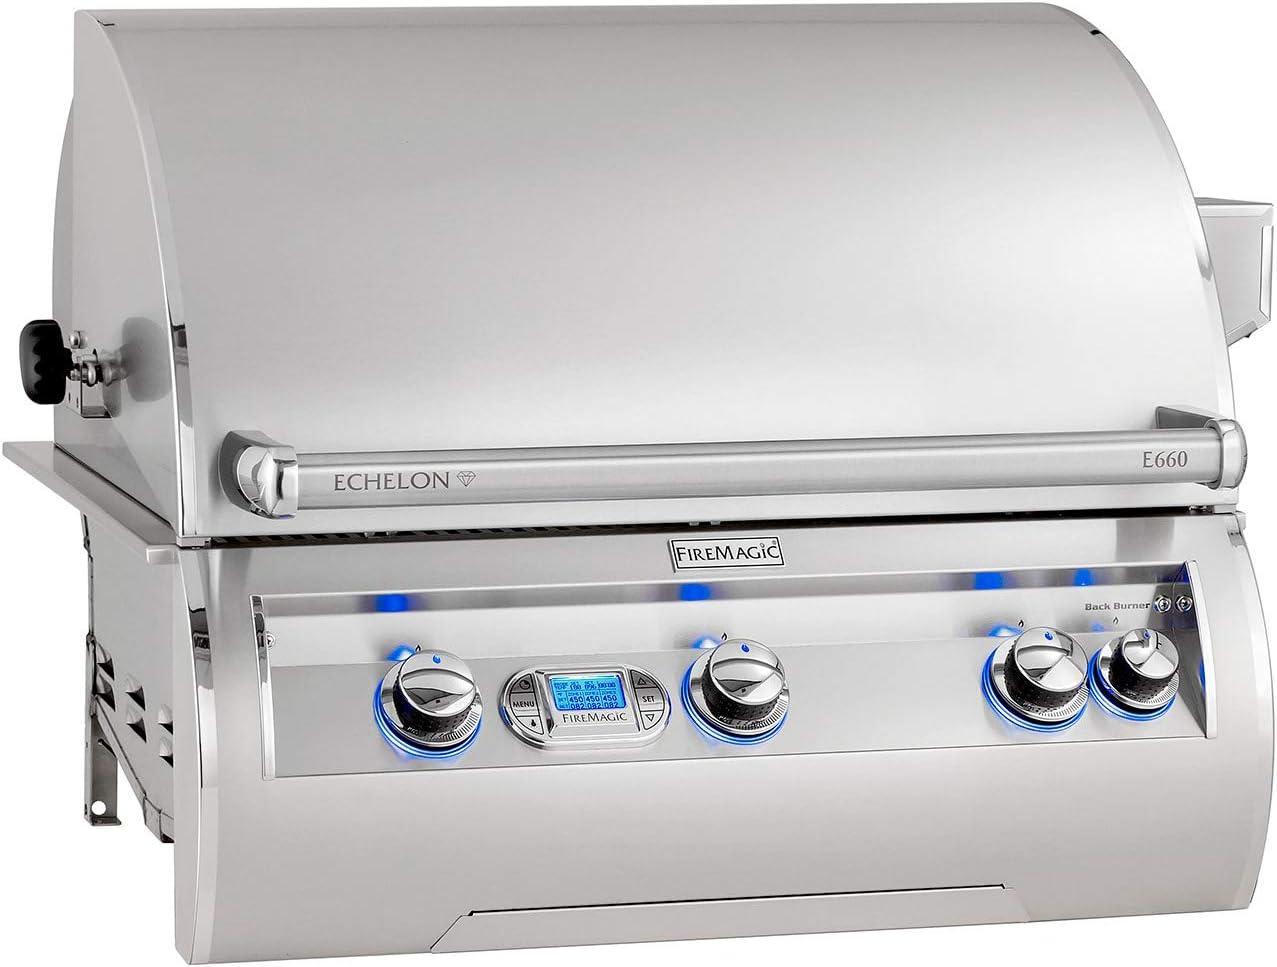 E1060I-8L1N-W Magic View Window /& Digital Thermometer Rotisserie Fire Magic Echelon Diamond E1060I 48-Inch Built-in Natural Gas Grill W//One Infrared Burner